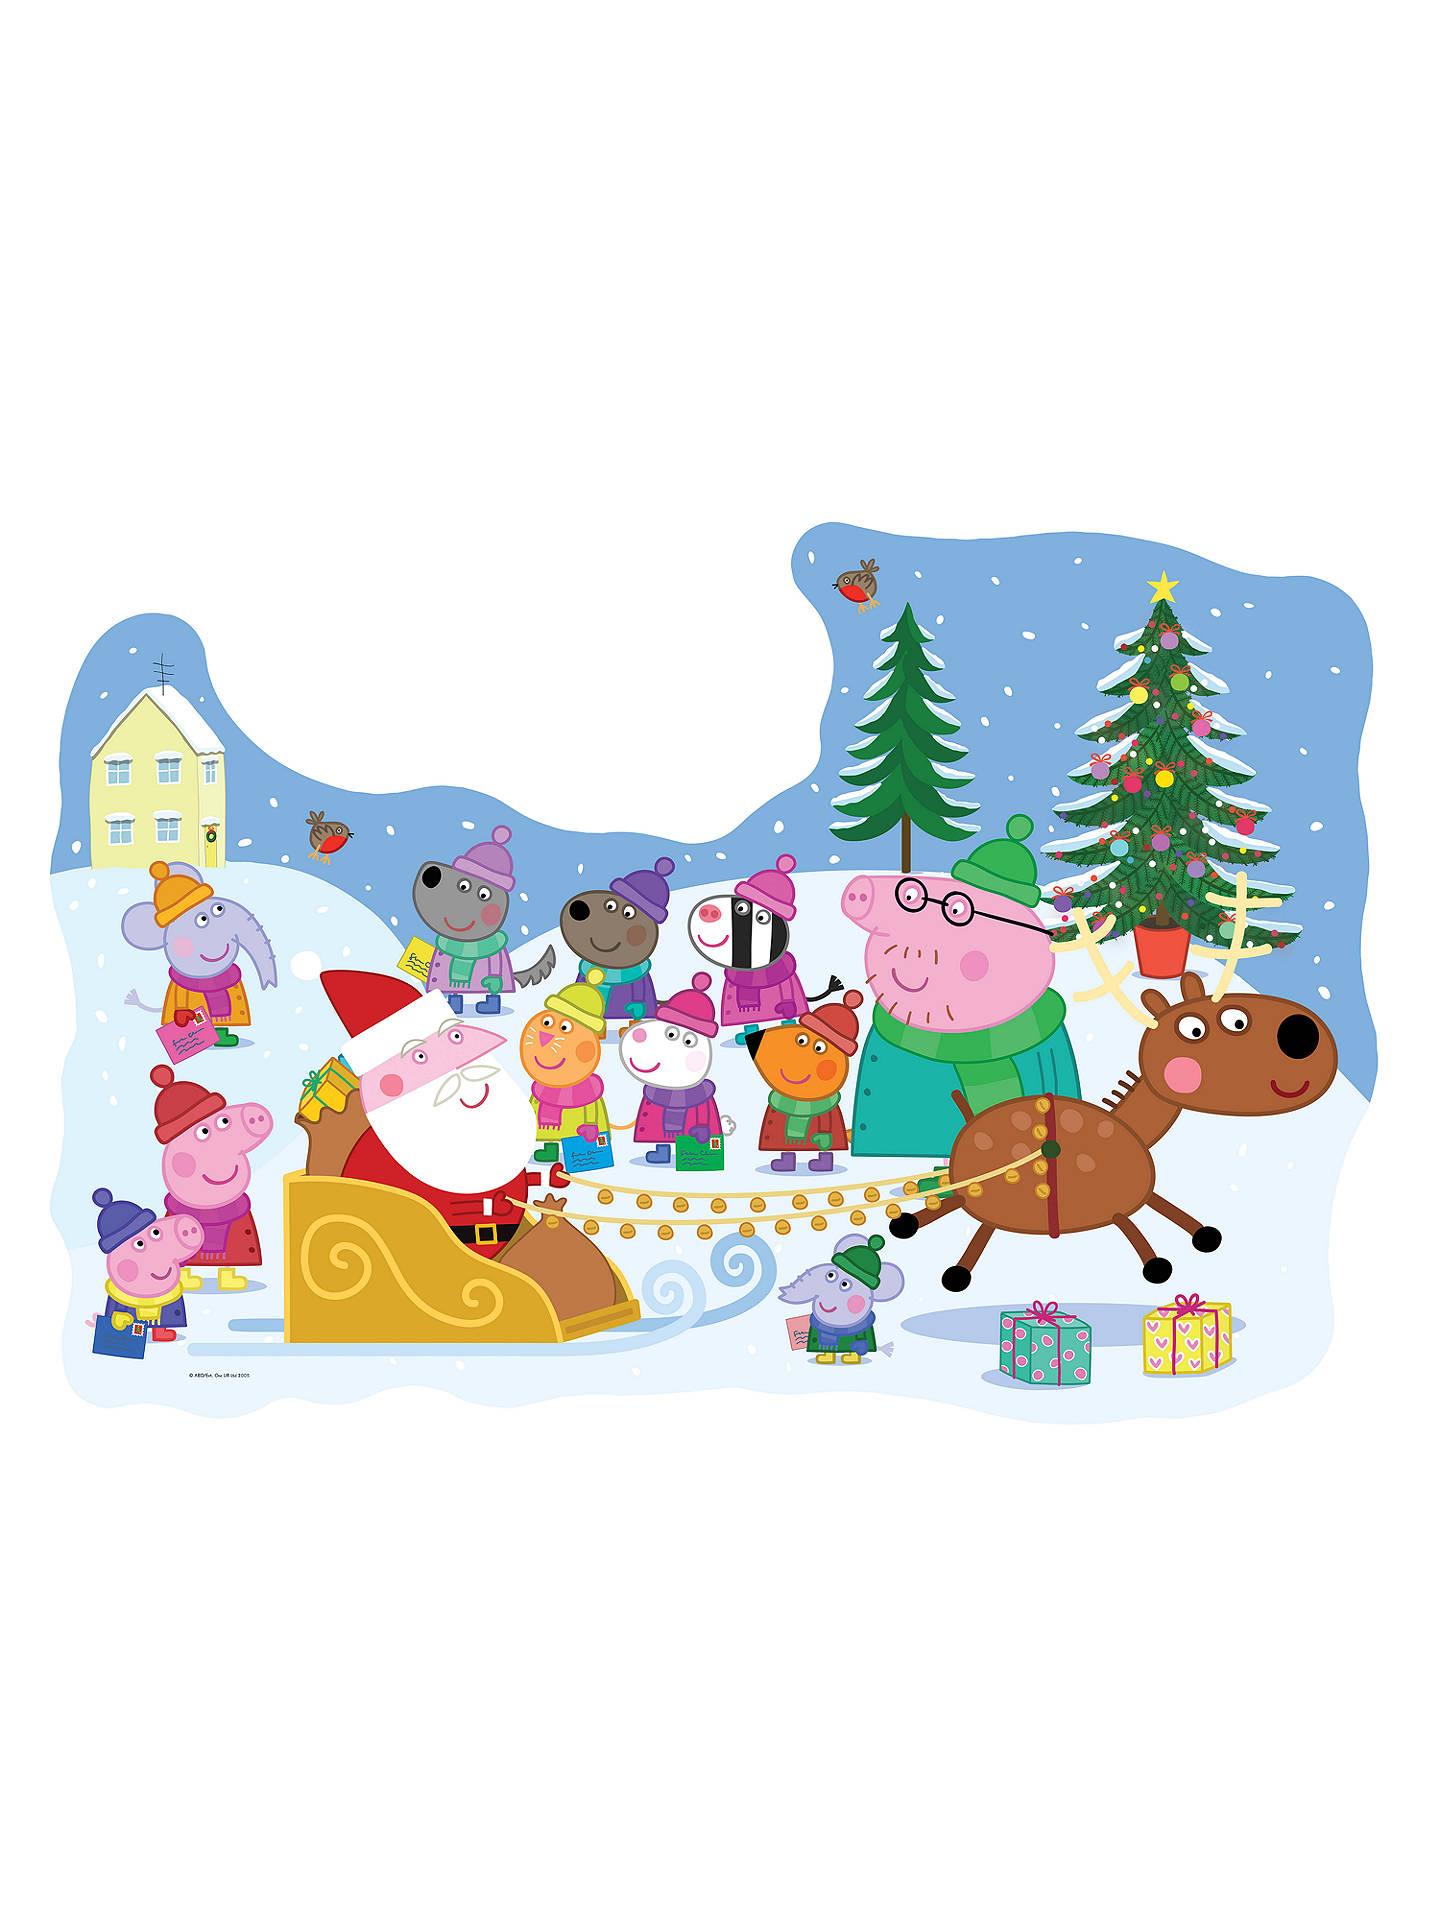 Ravensburger Peppa Pig Christmas Floor Jigsaw Puzzle 32